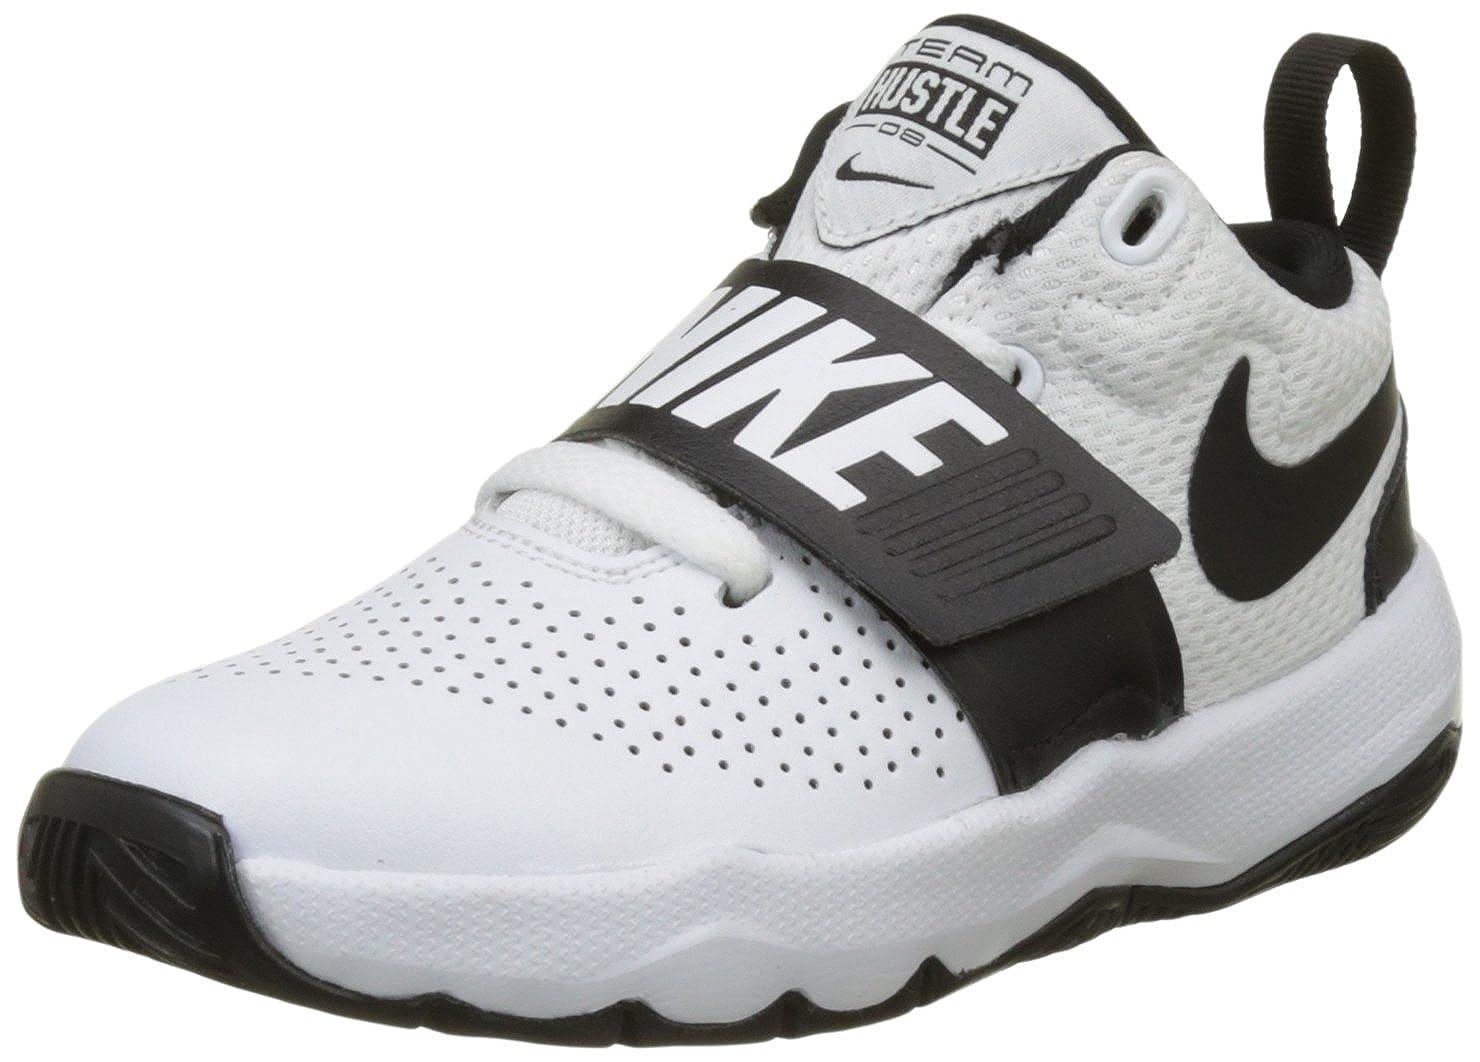 new products 2ec7d f8c72 Amazon.com   Nike Boy s Team Hustle D 8 (PS) Pre School Basketball Shoe  White Black Size 11 Kids US   Basketball